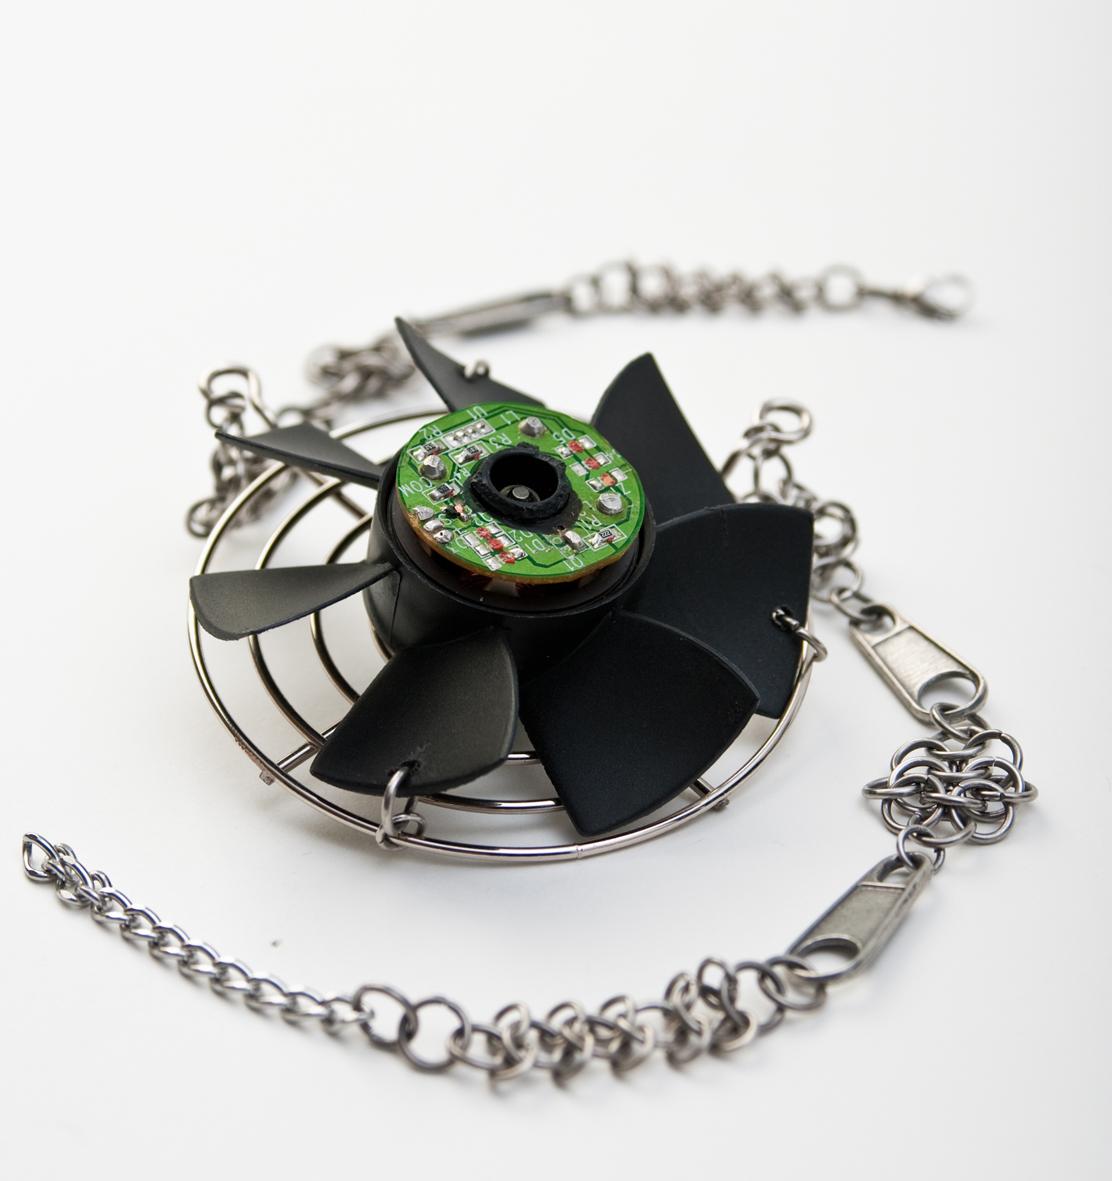 [ecolo geek] Des bijoux geek, chics et verts!